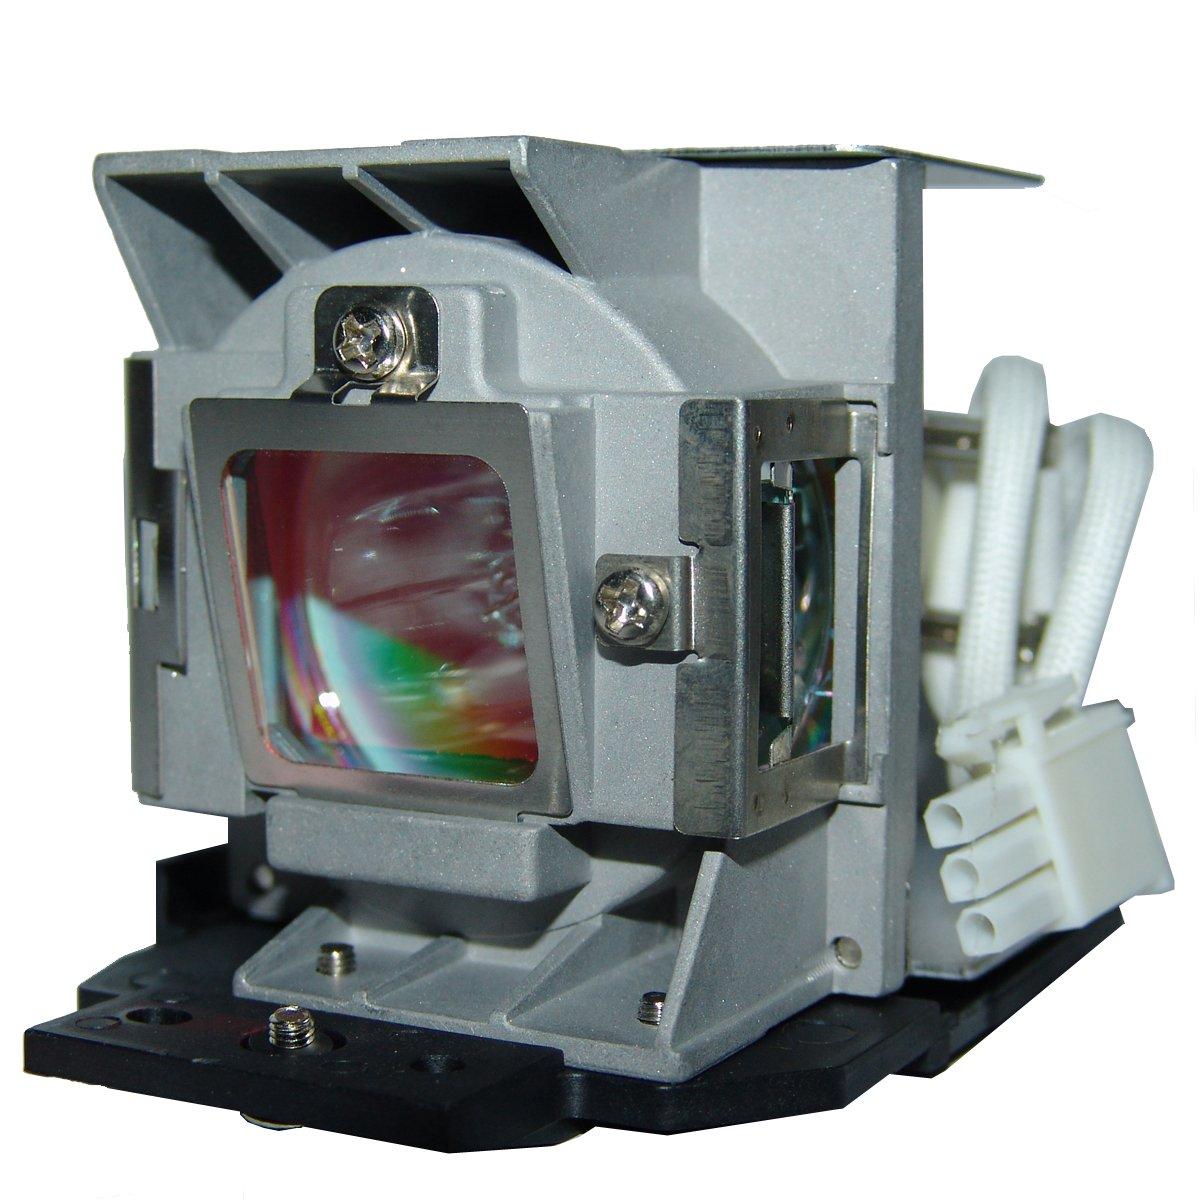 MicroLampプロジェクターランプfor BenQ 3500時間、230ワット、5j.j3 a05.001 ( 3500時間、230ワットmx880-ust )   B00SH1TRZS